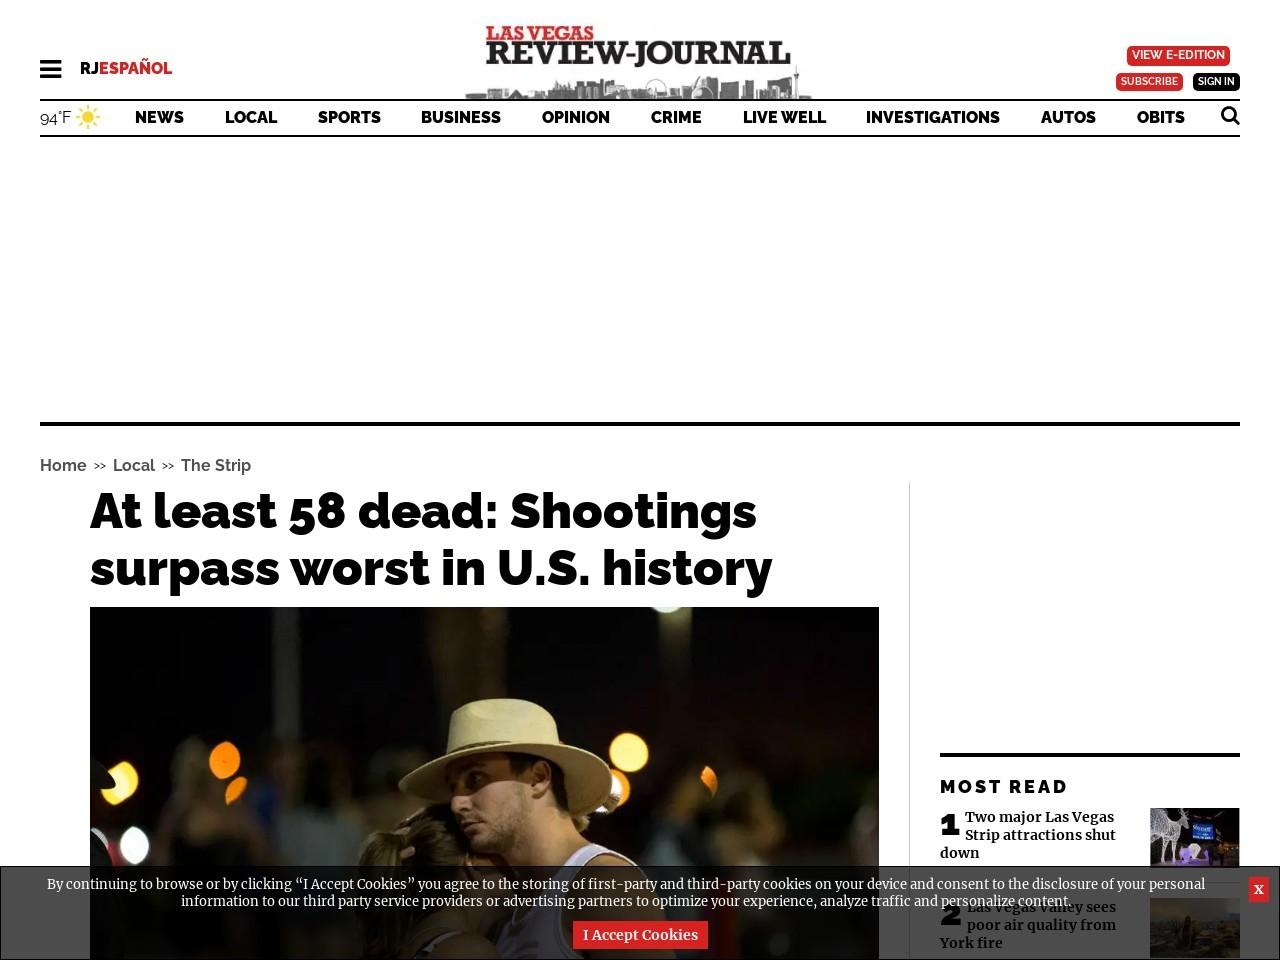 At least 50 dead: Shootings surpass worst in U.S. history